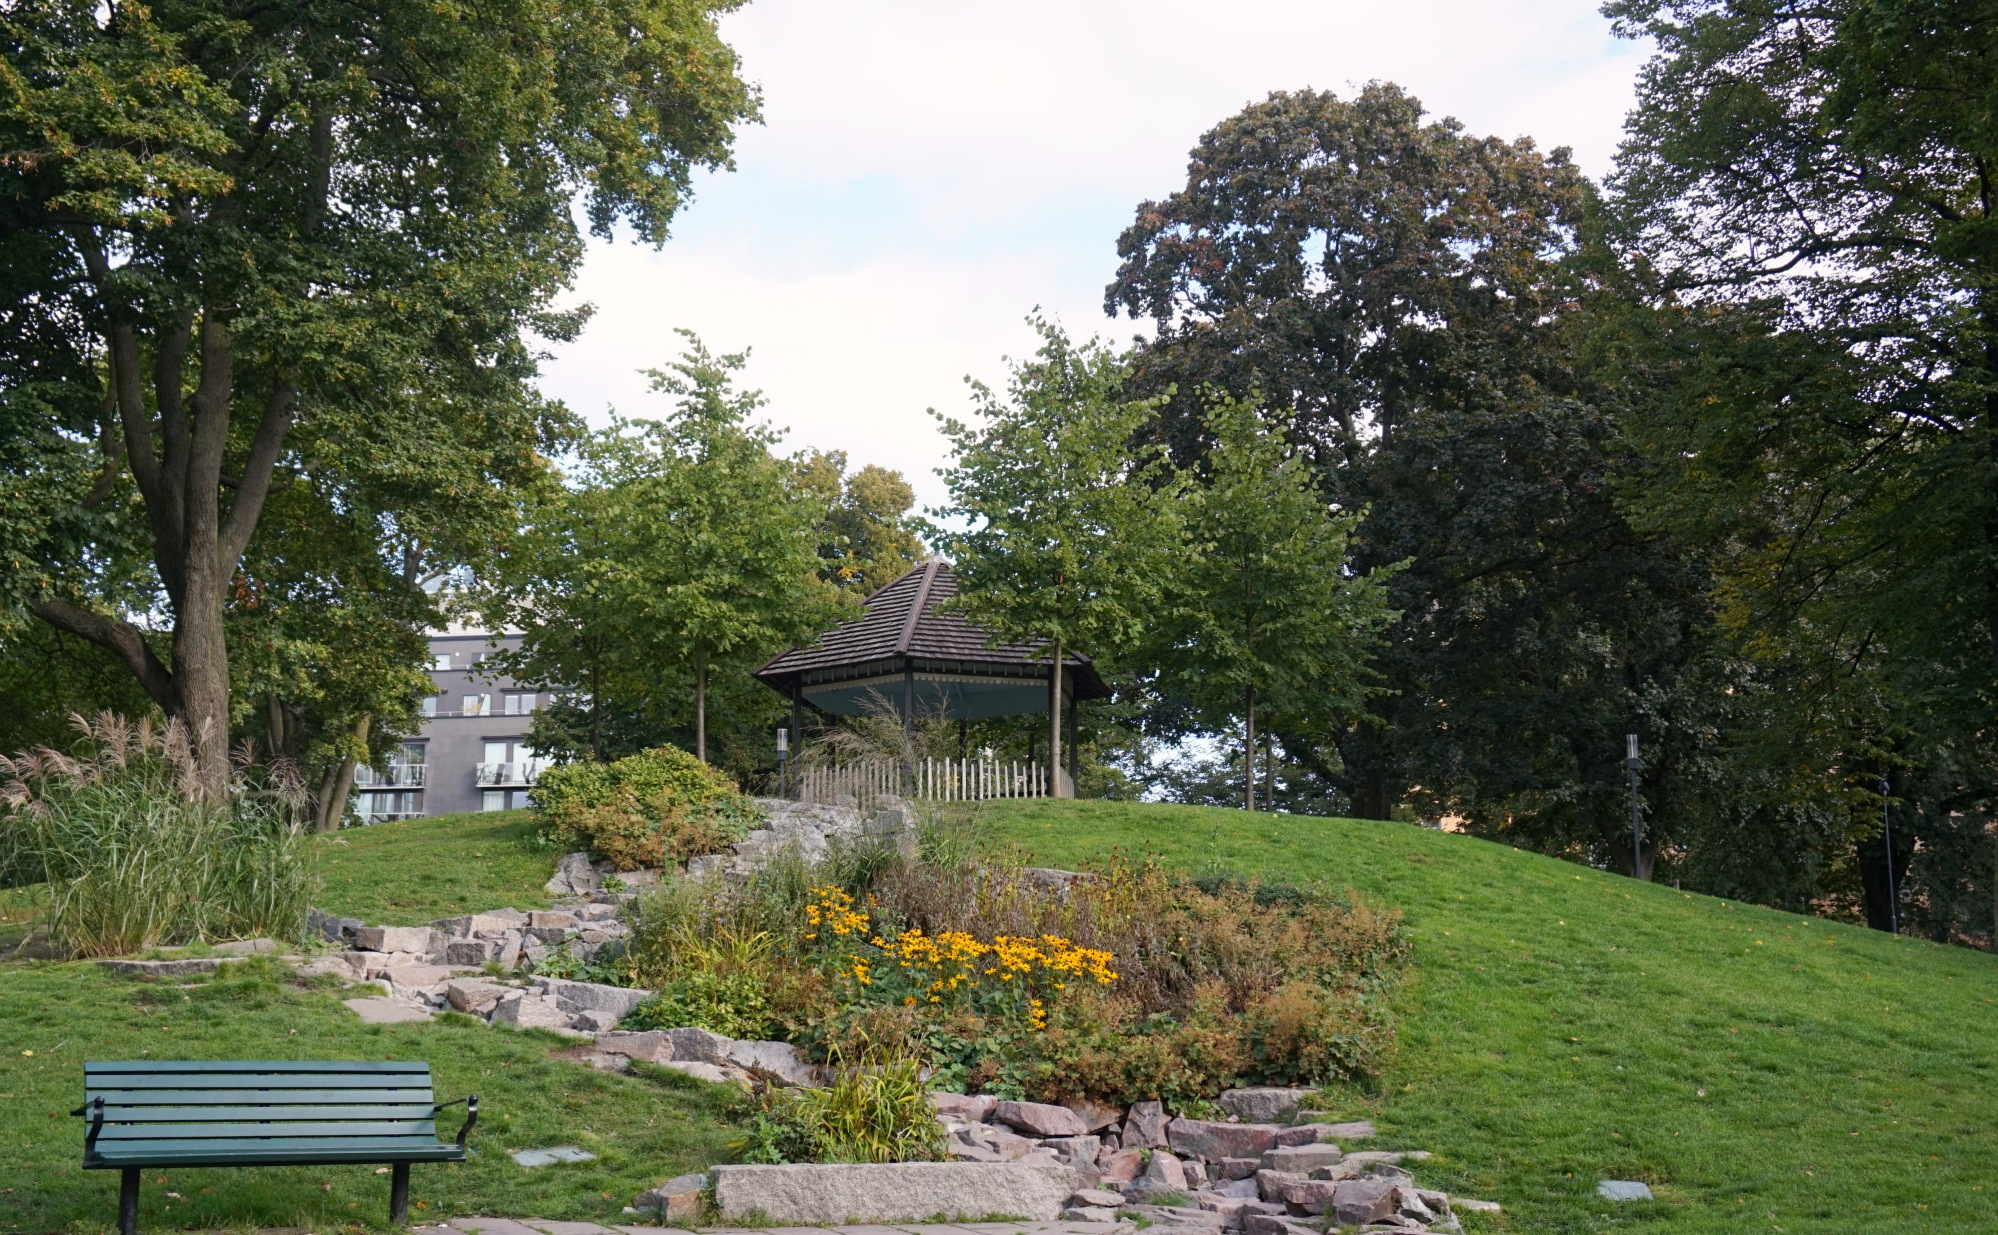 3-jours-a-stockholm-89